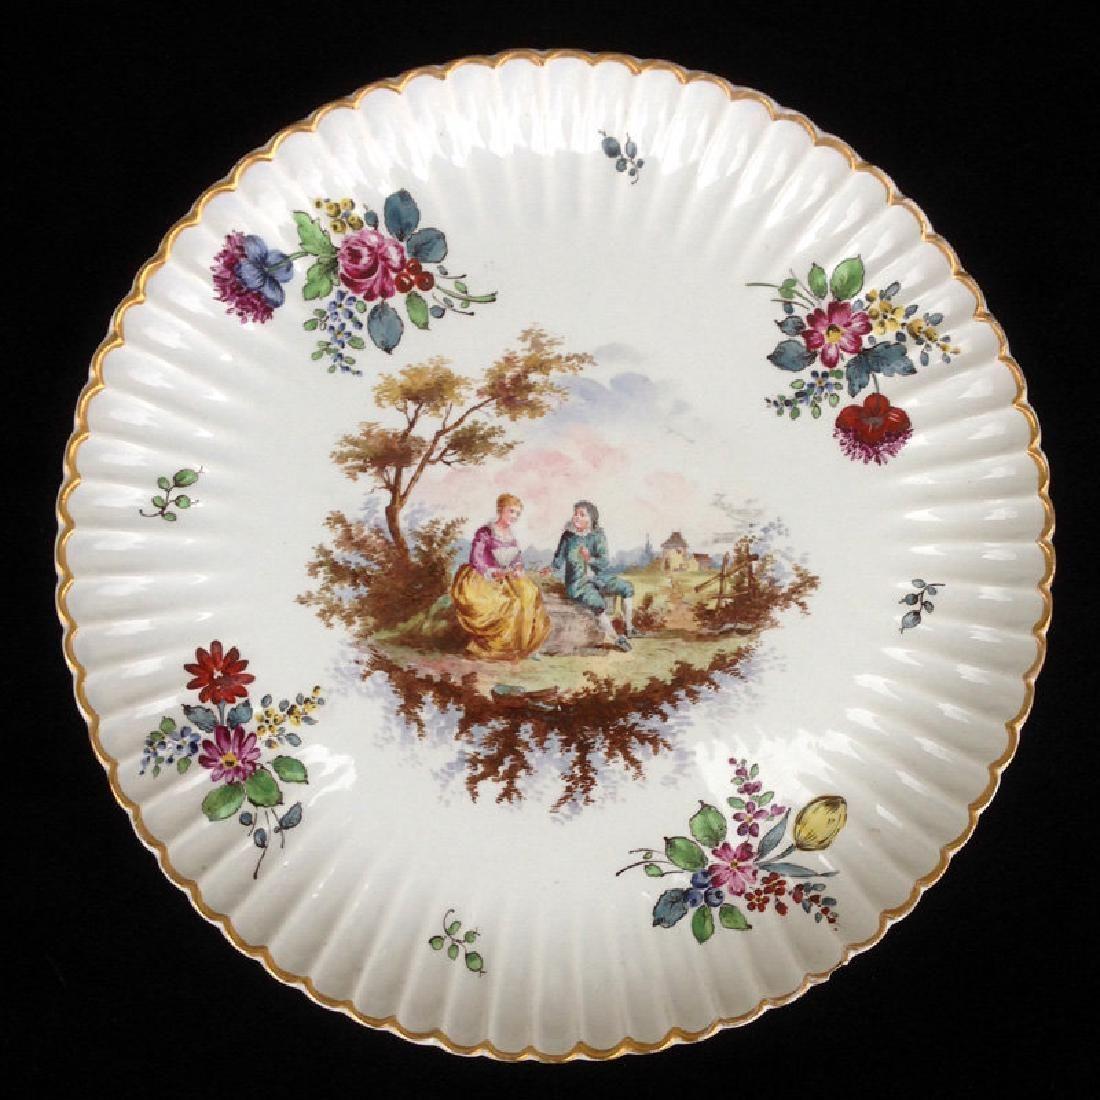 Late 19th C. Samson Hoechst Large Dish